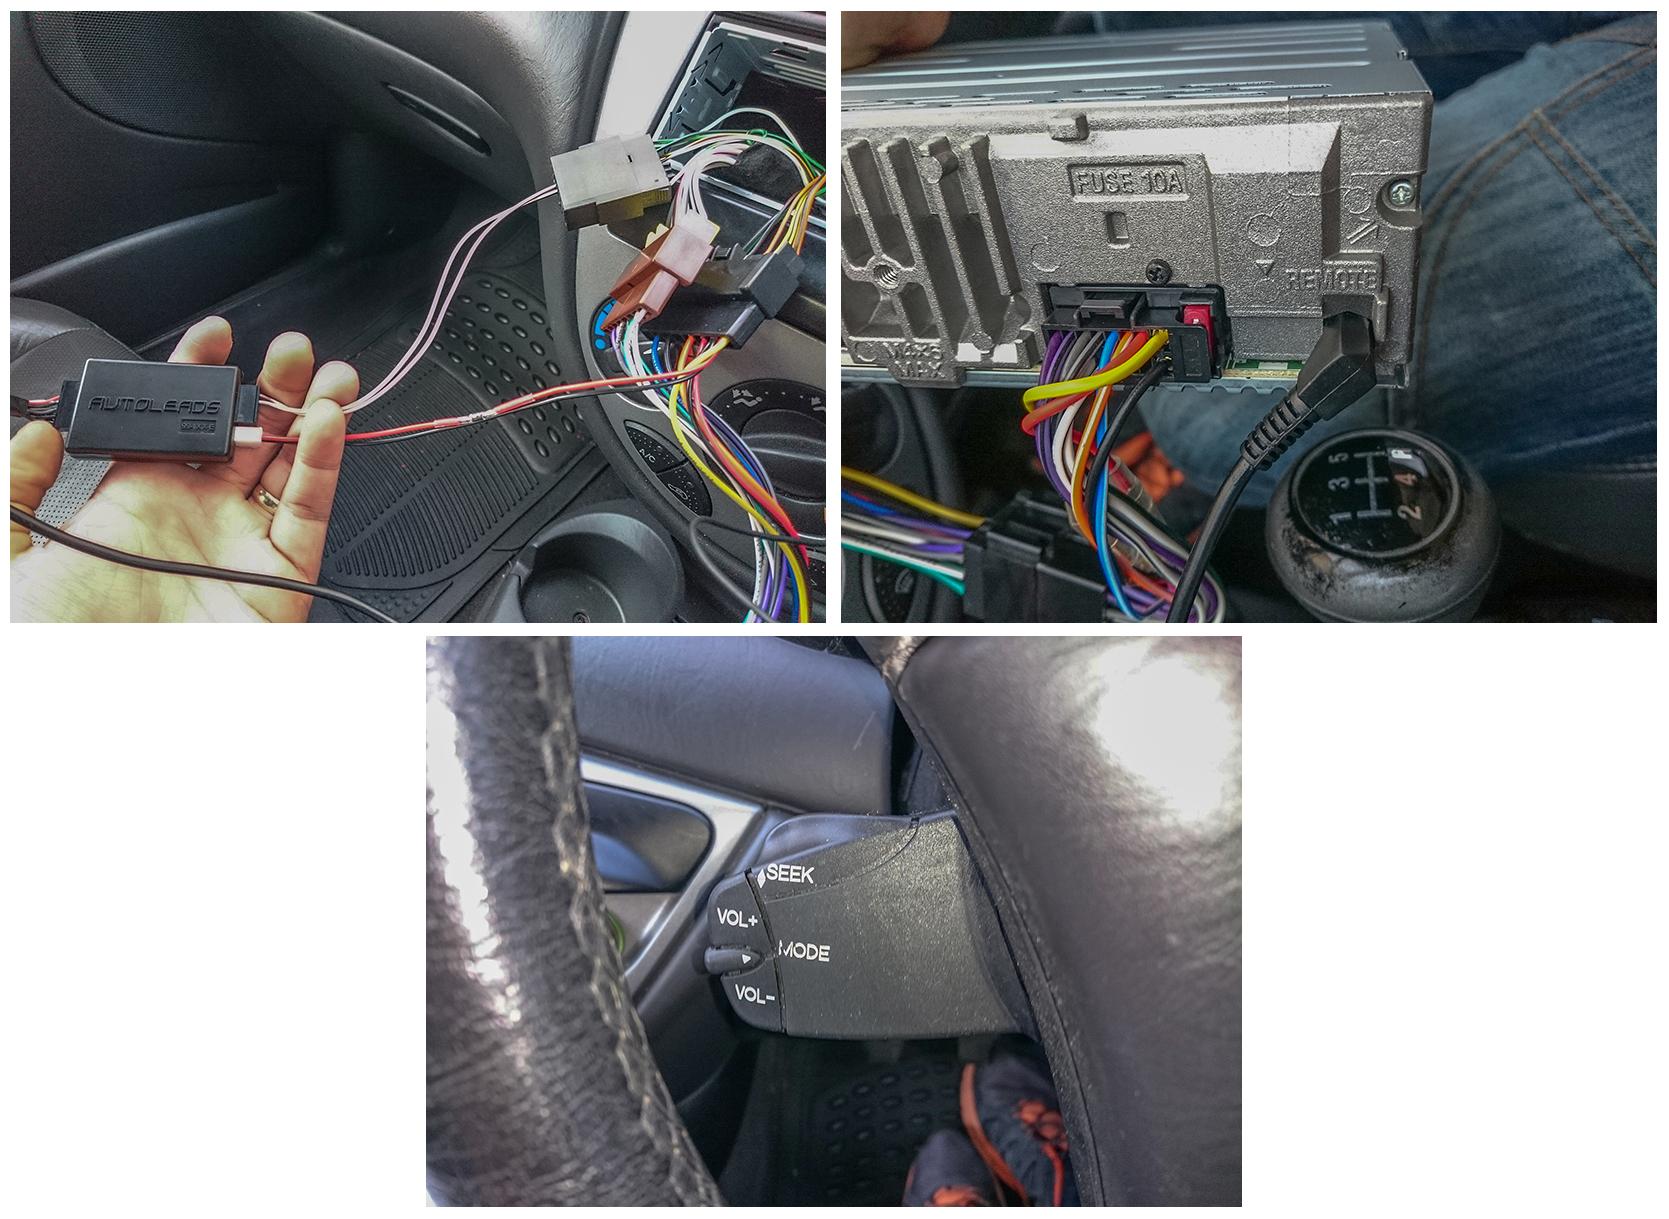 Steering Stalk Controls For Sony Mex N5100bt Ford Focus Club Wiring Harness Dsc 0051